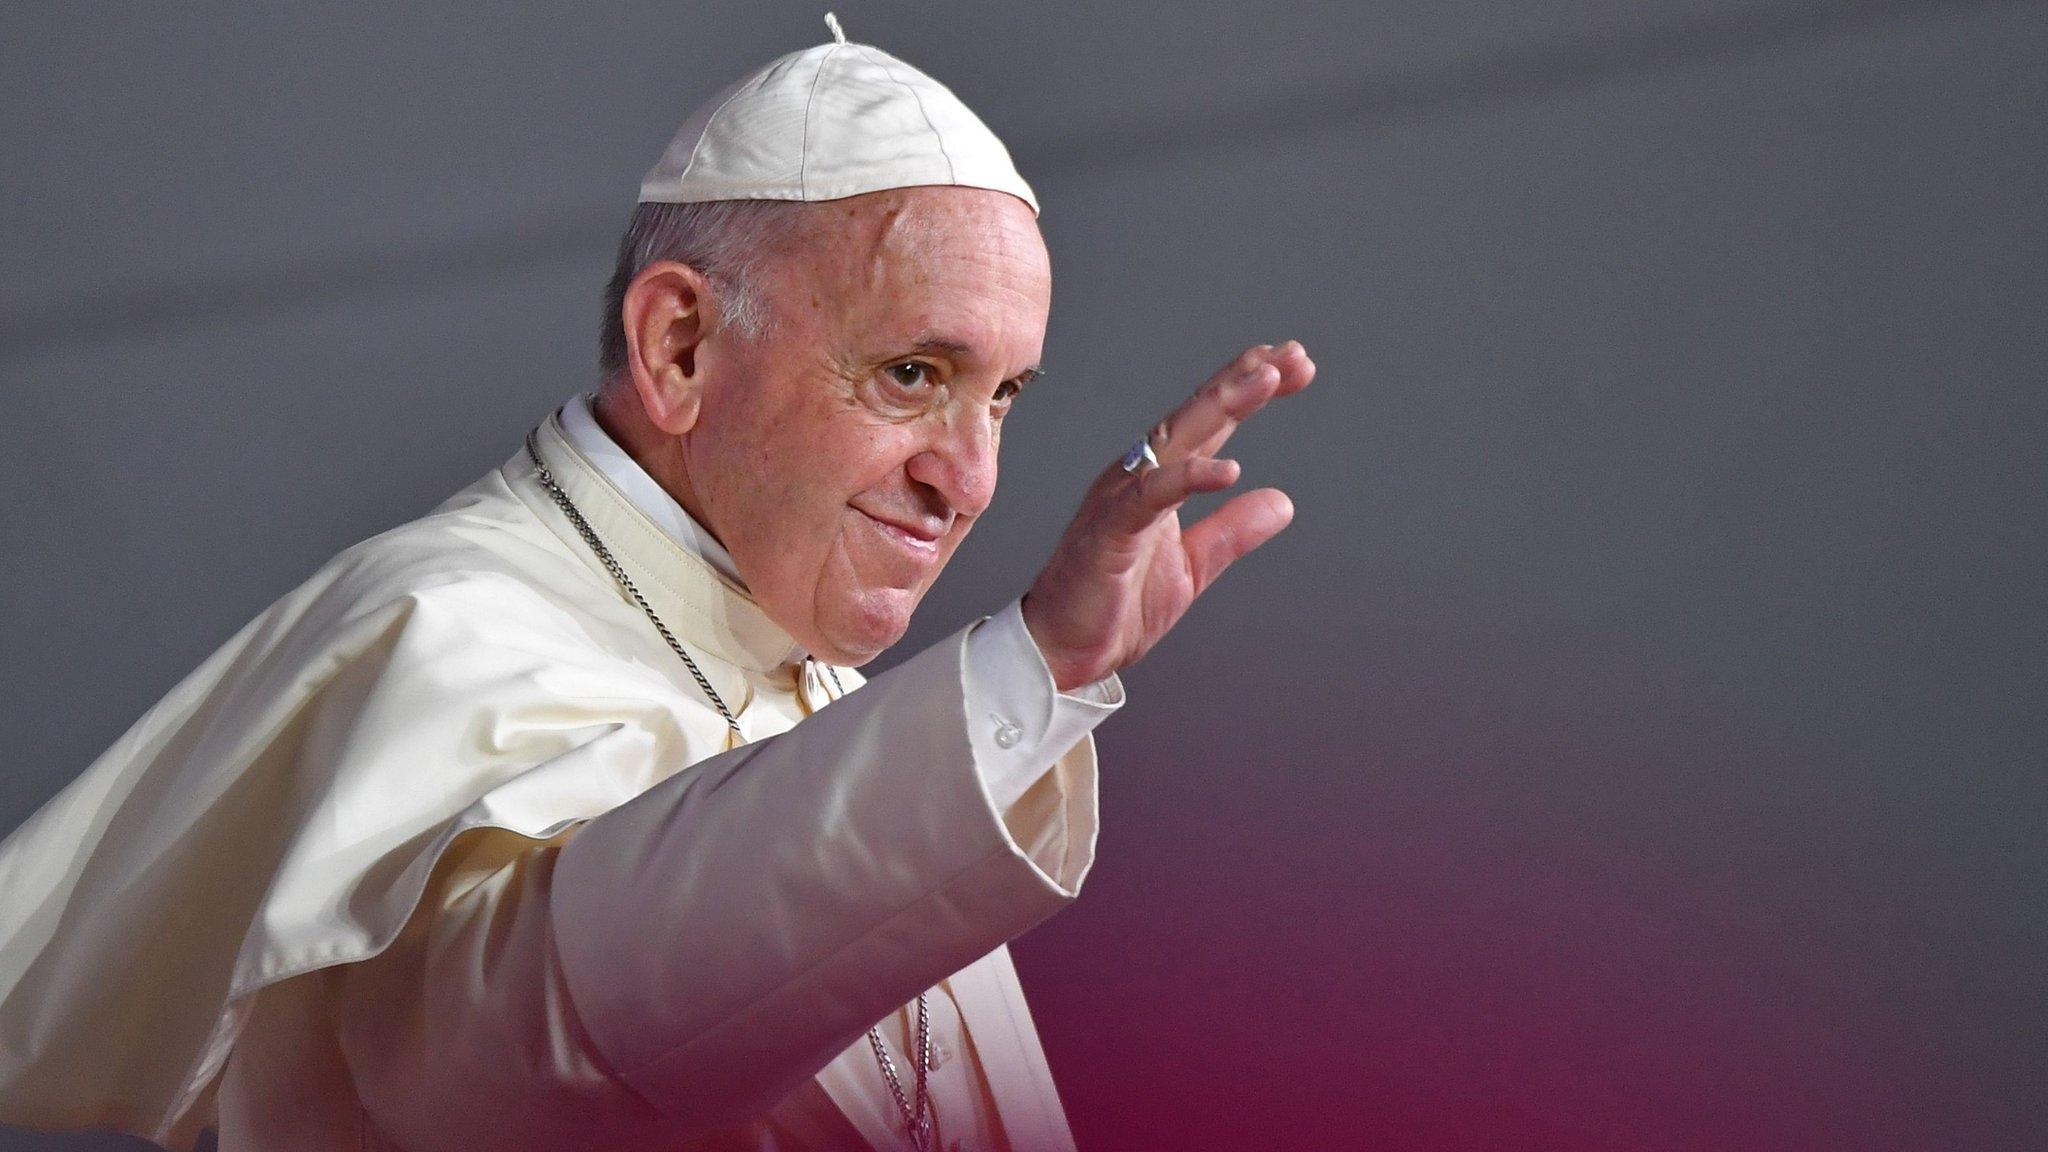 Catholic cardinals urge end of 'homosexual agenda'